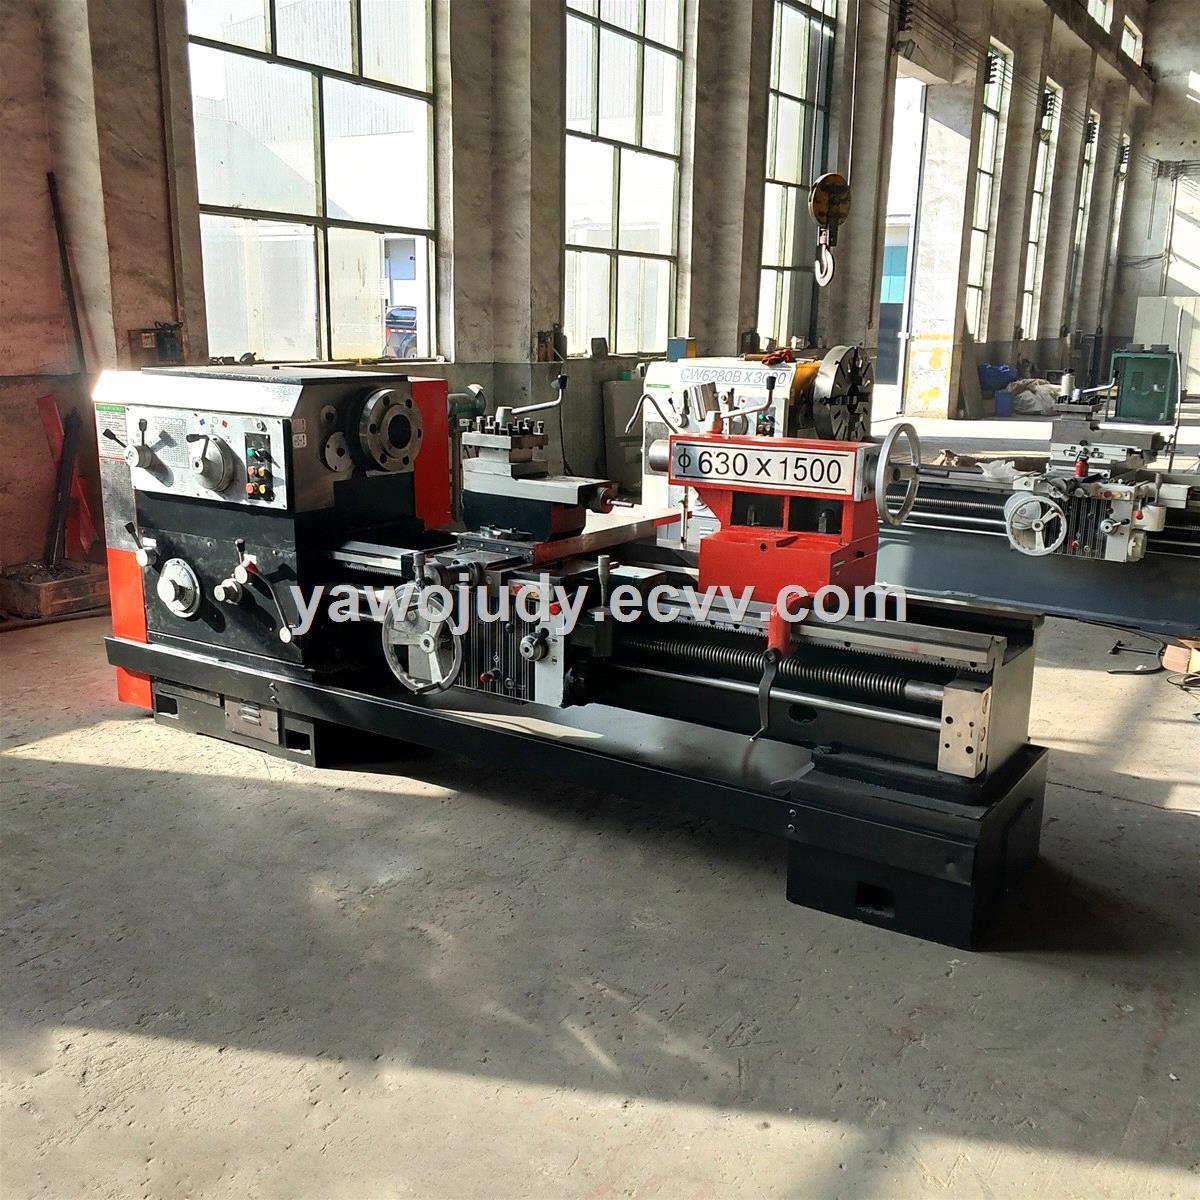 Manual Lathe machine horizontal turning lathe with high precision